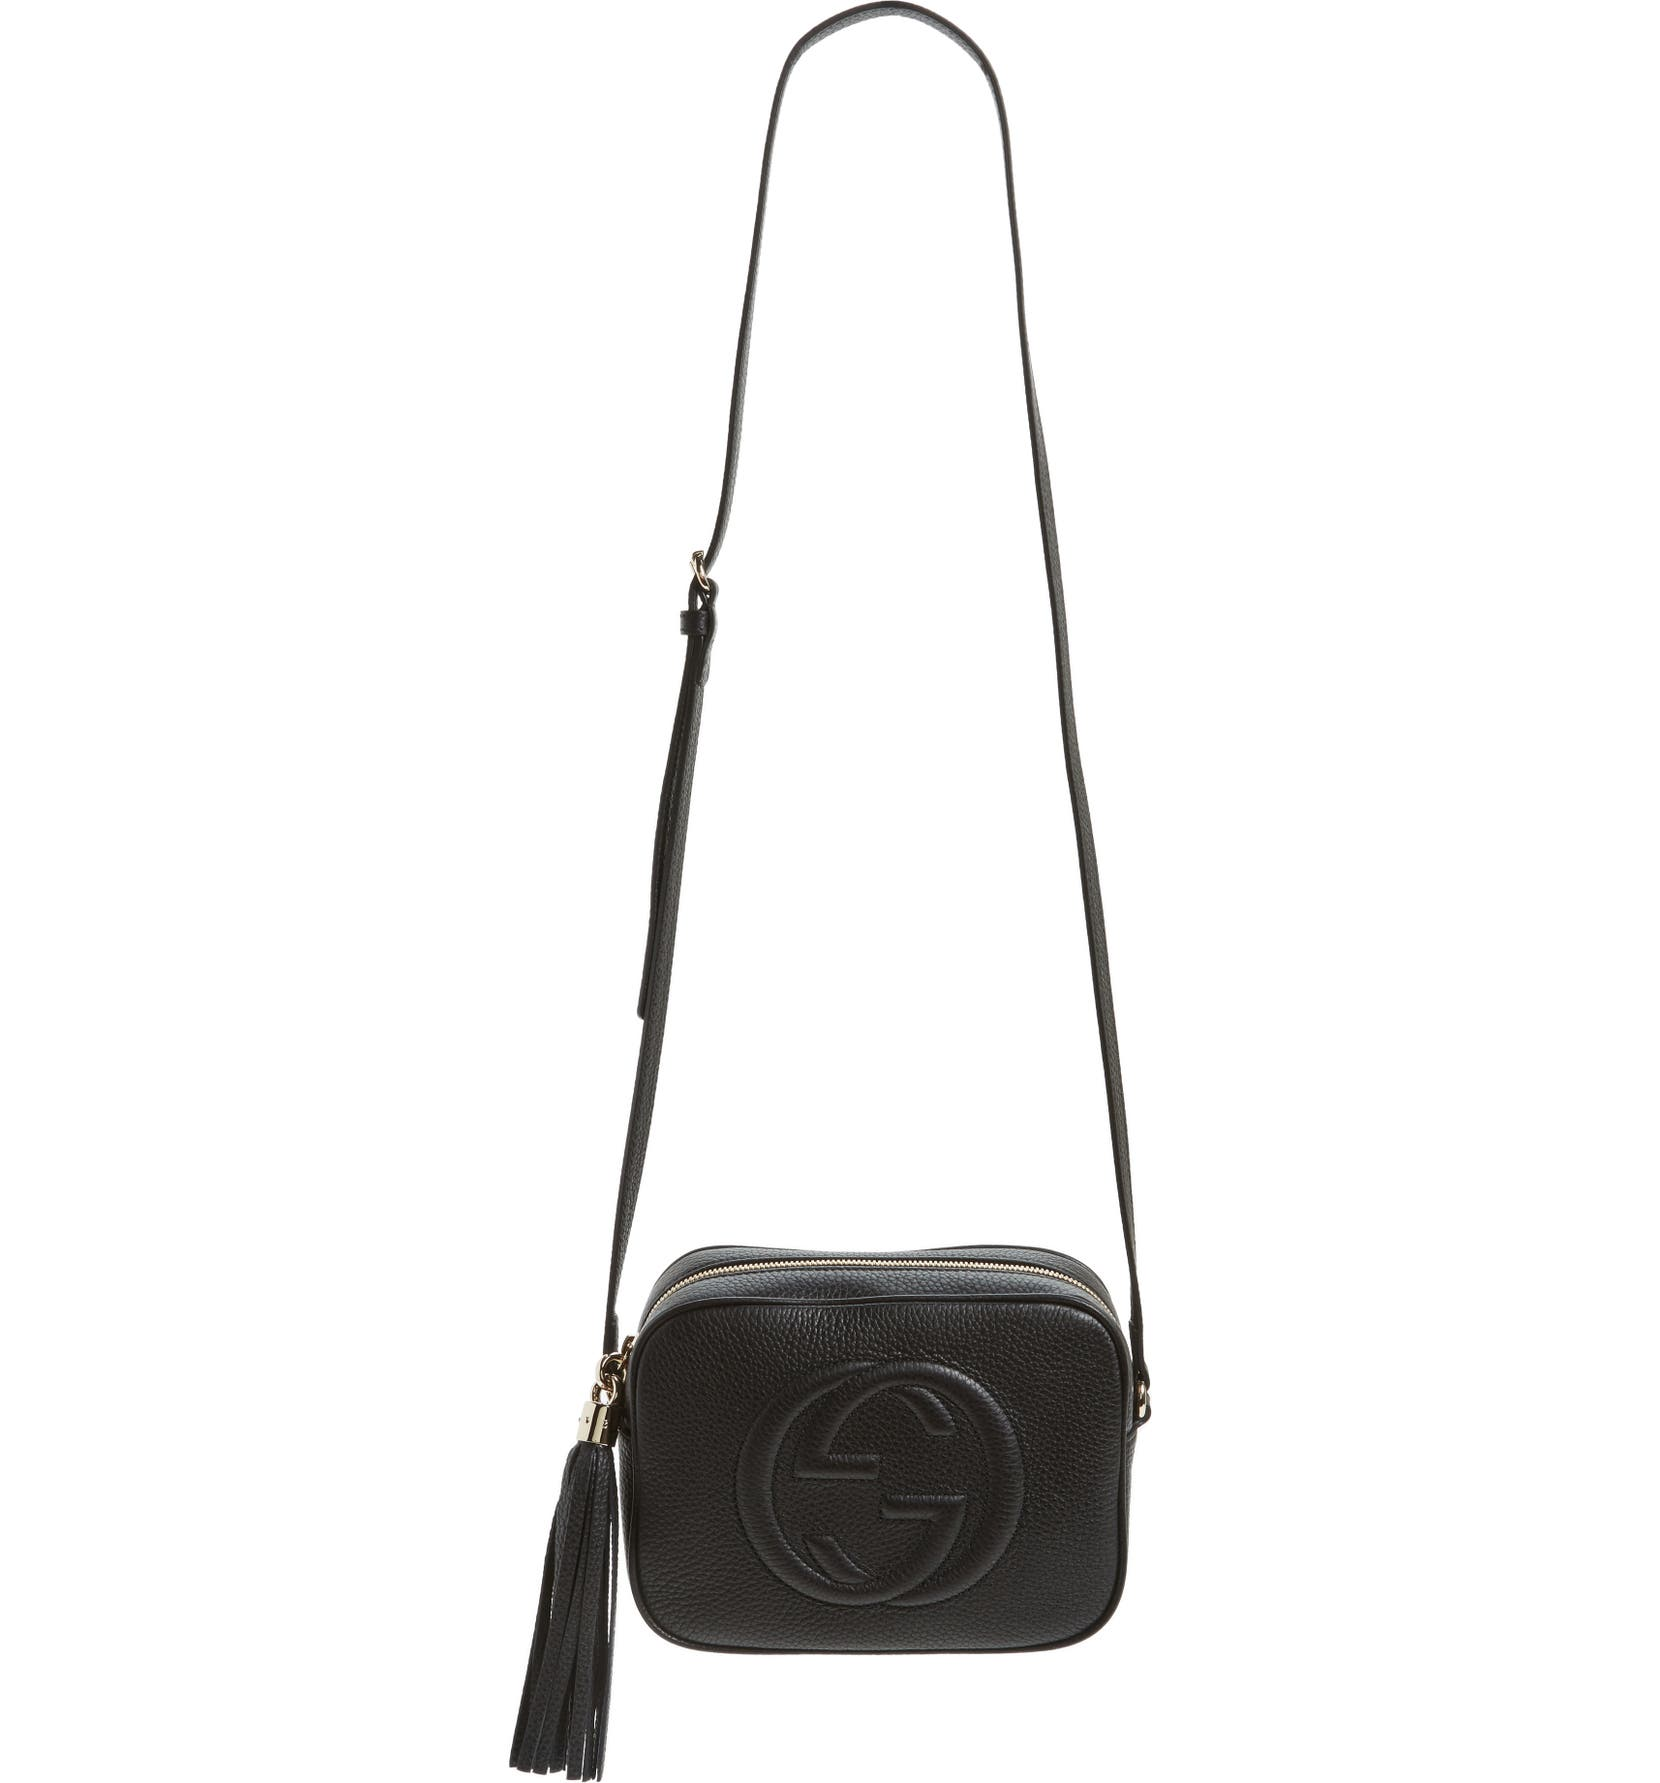 82a0bc08ec14 Gucci Soho Disco Leather Bag